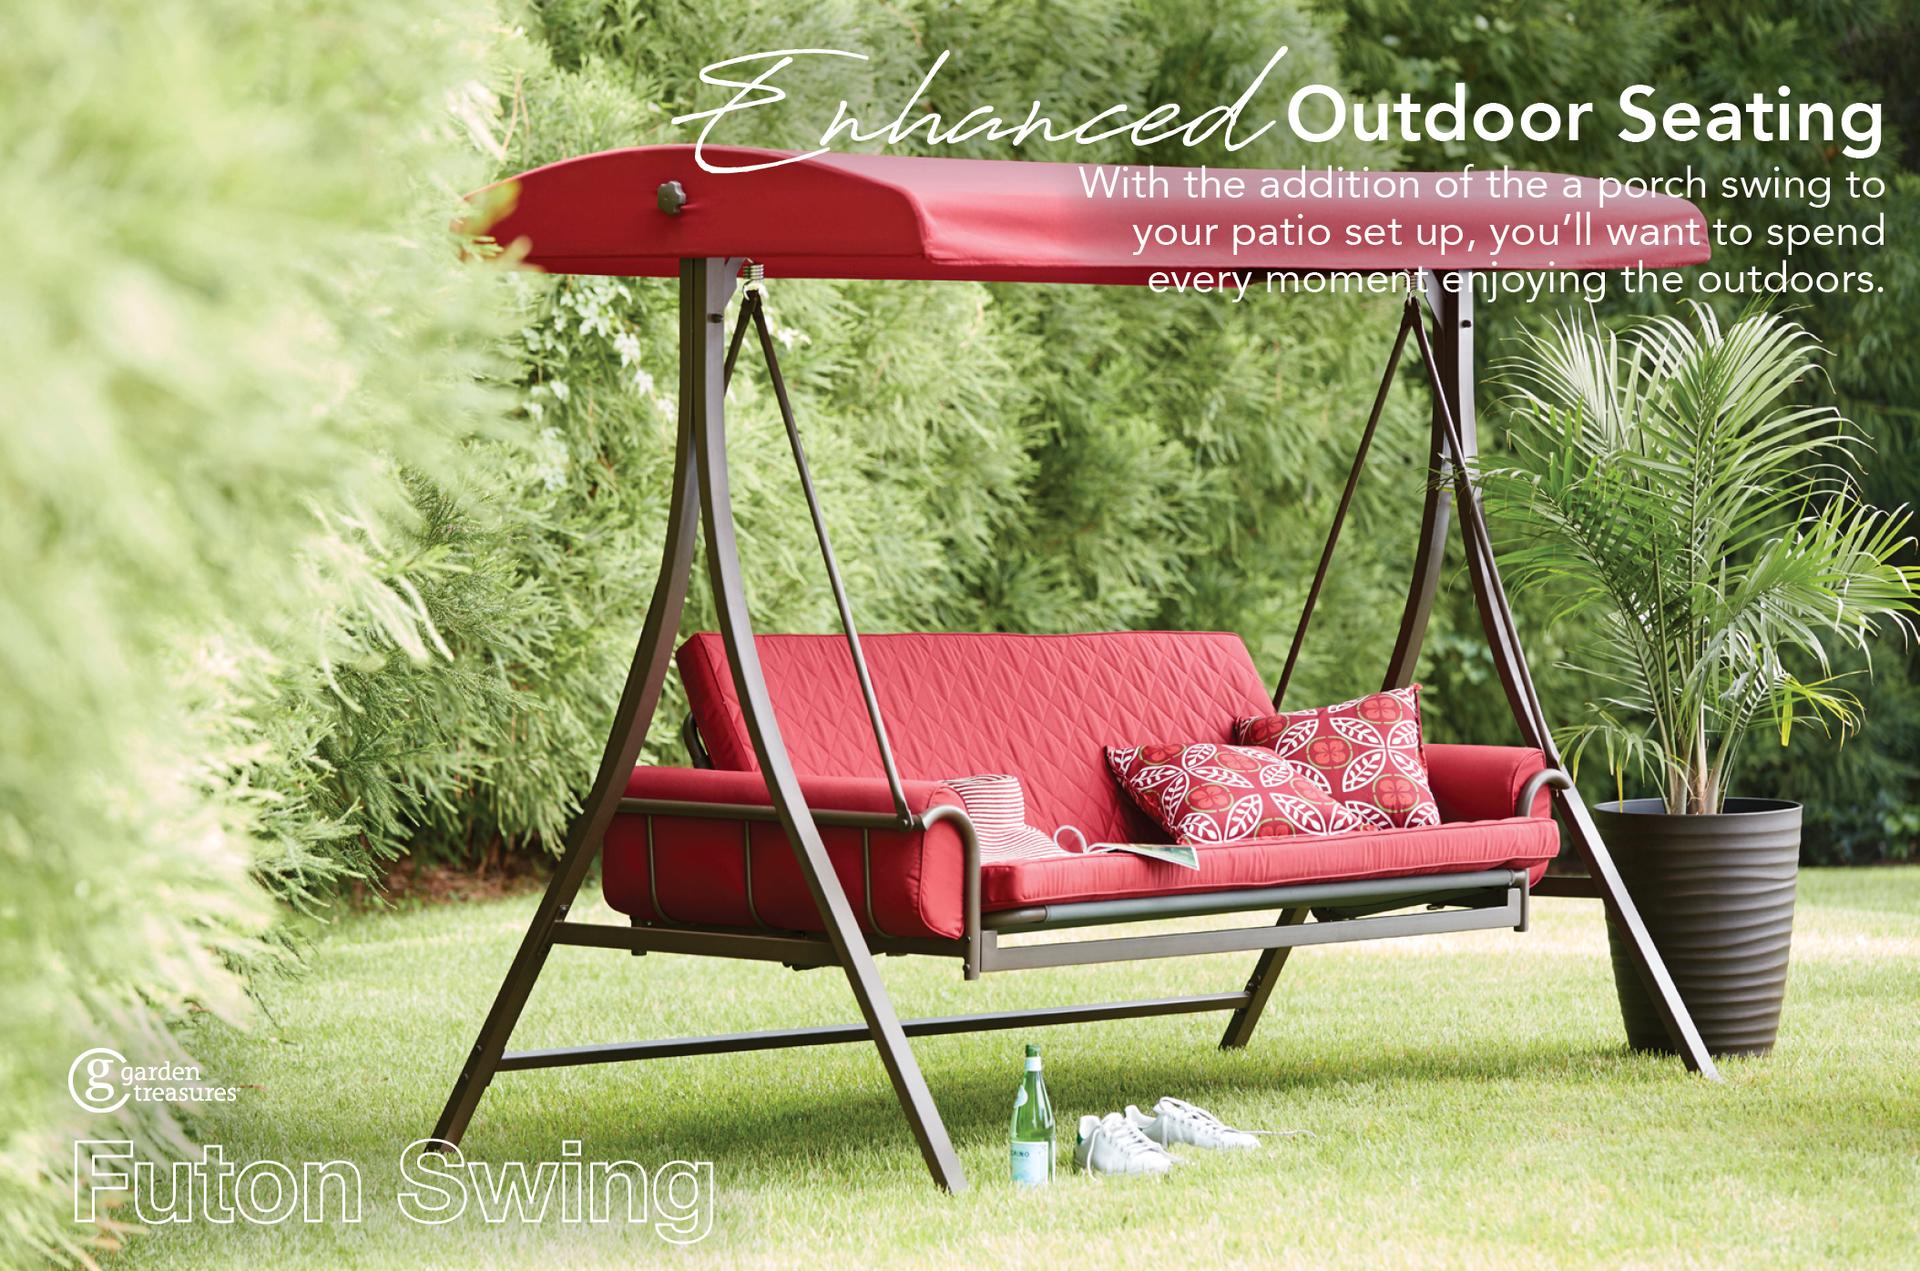 garden treasures 0878764 3 seat swing size 7.87' x 6'